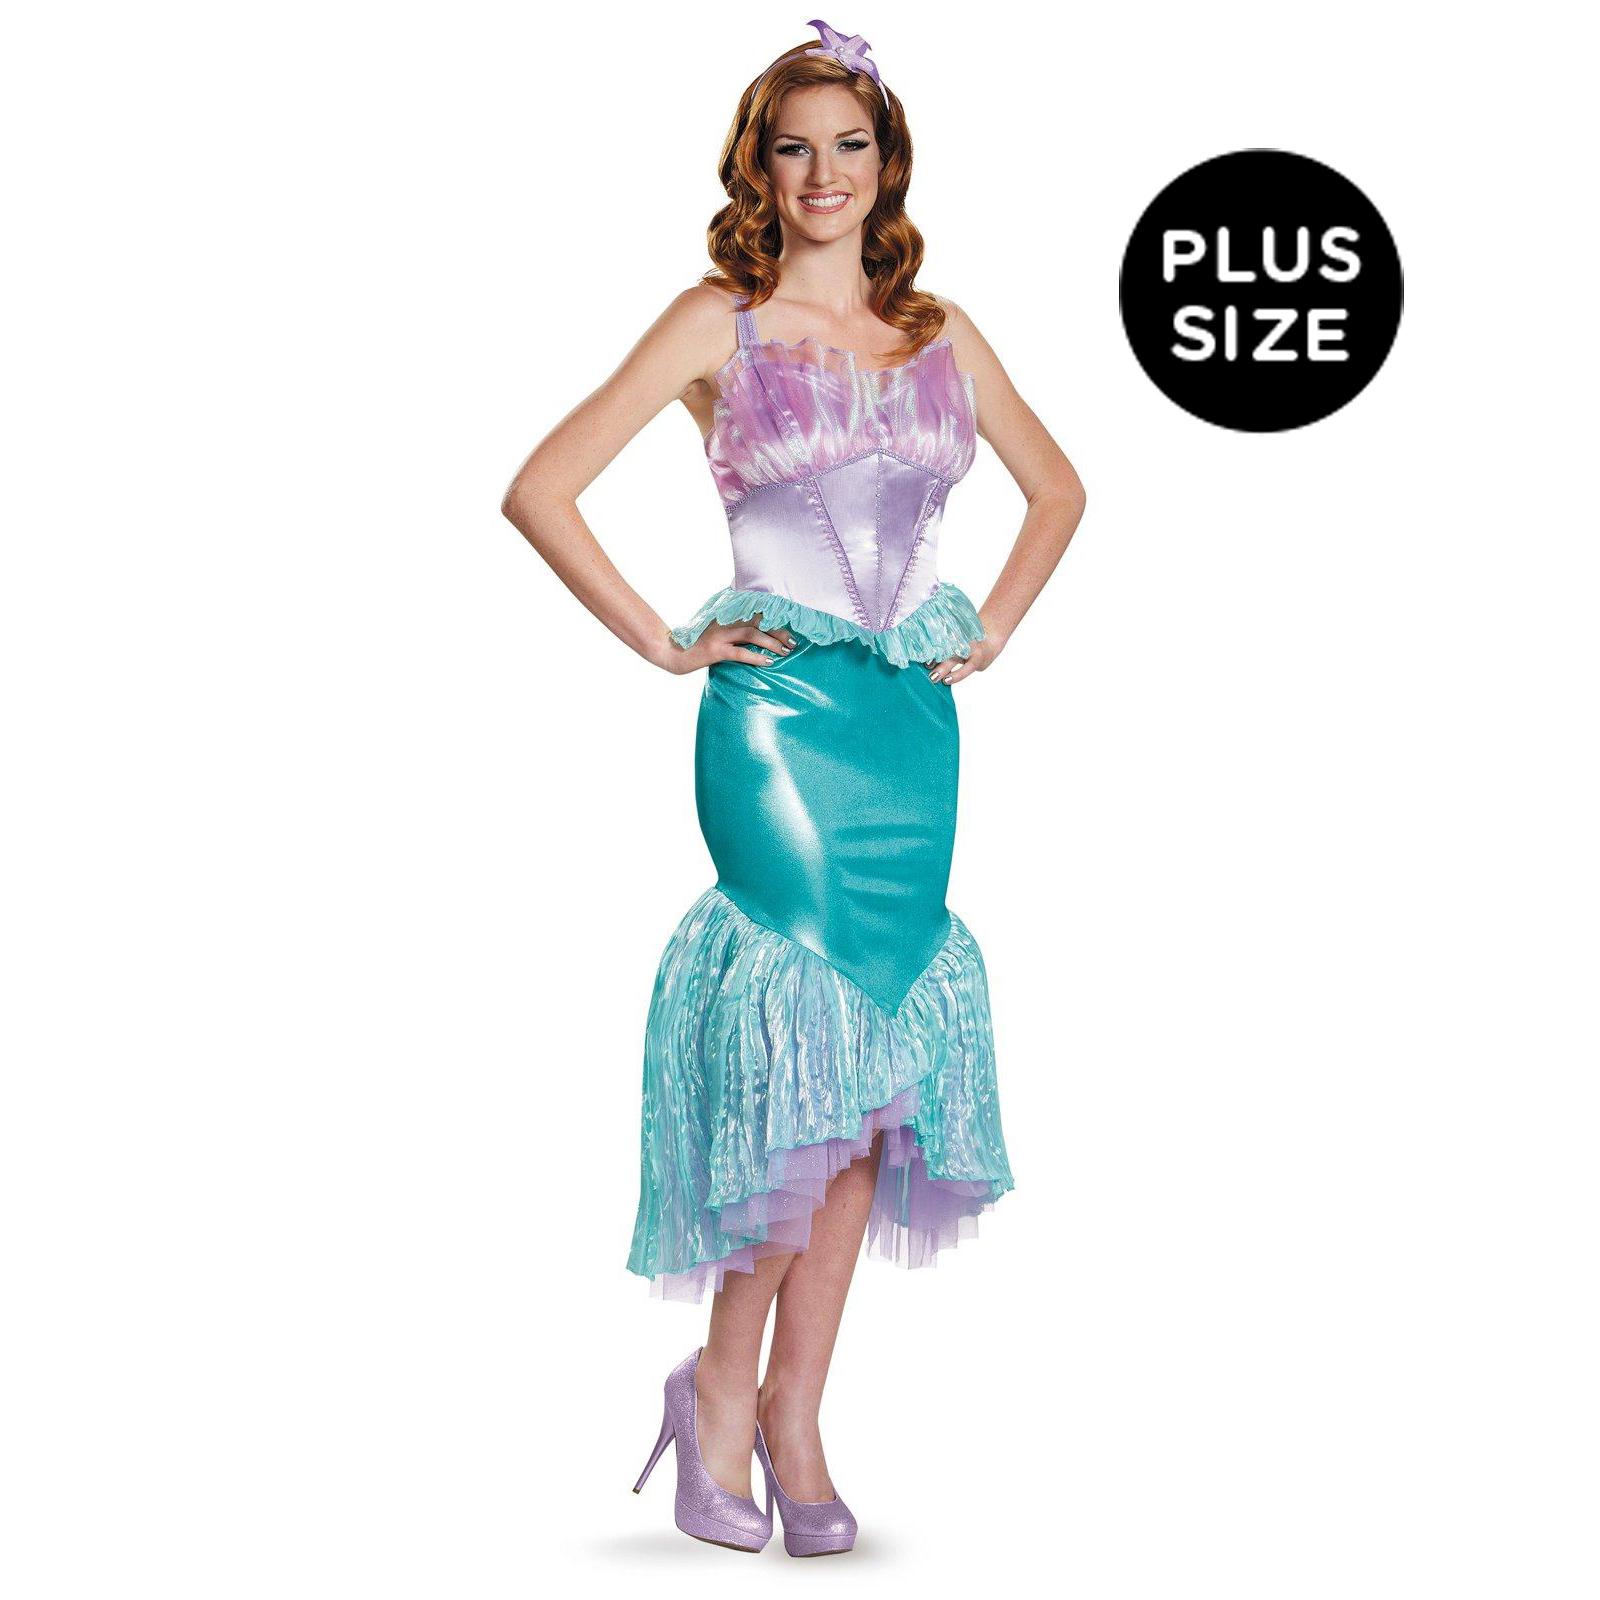 plus size dress up costumes 3t